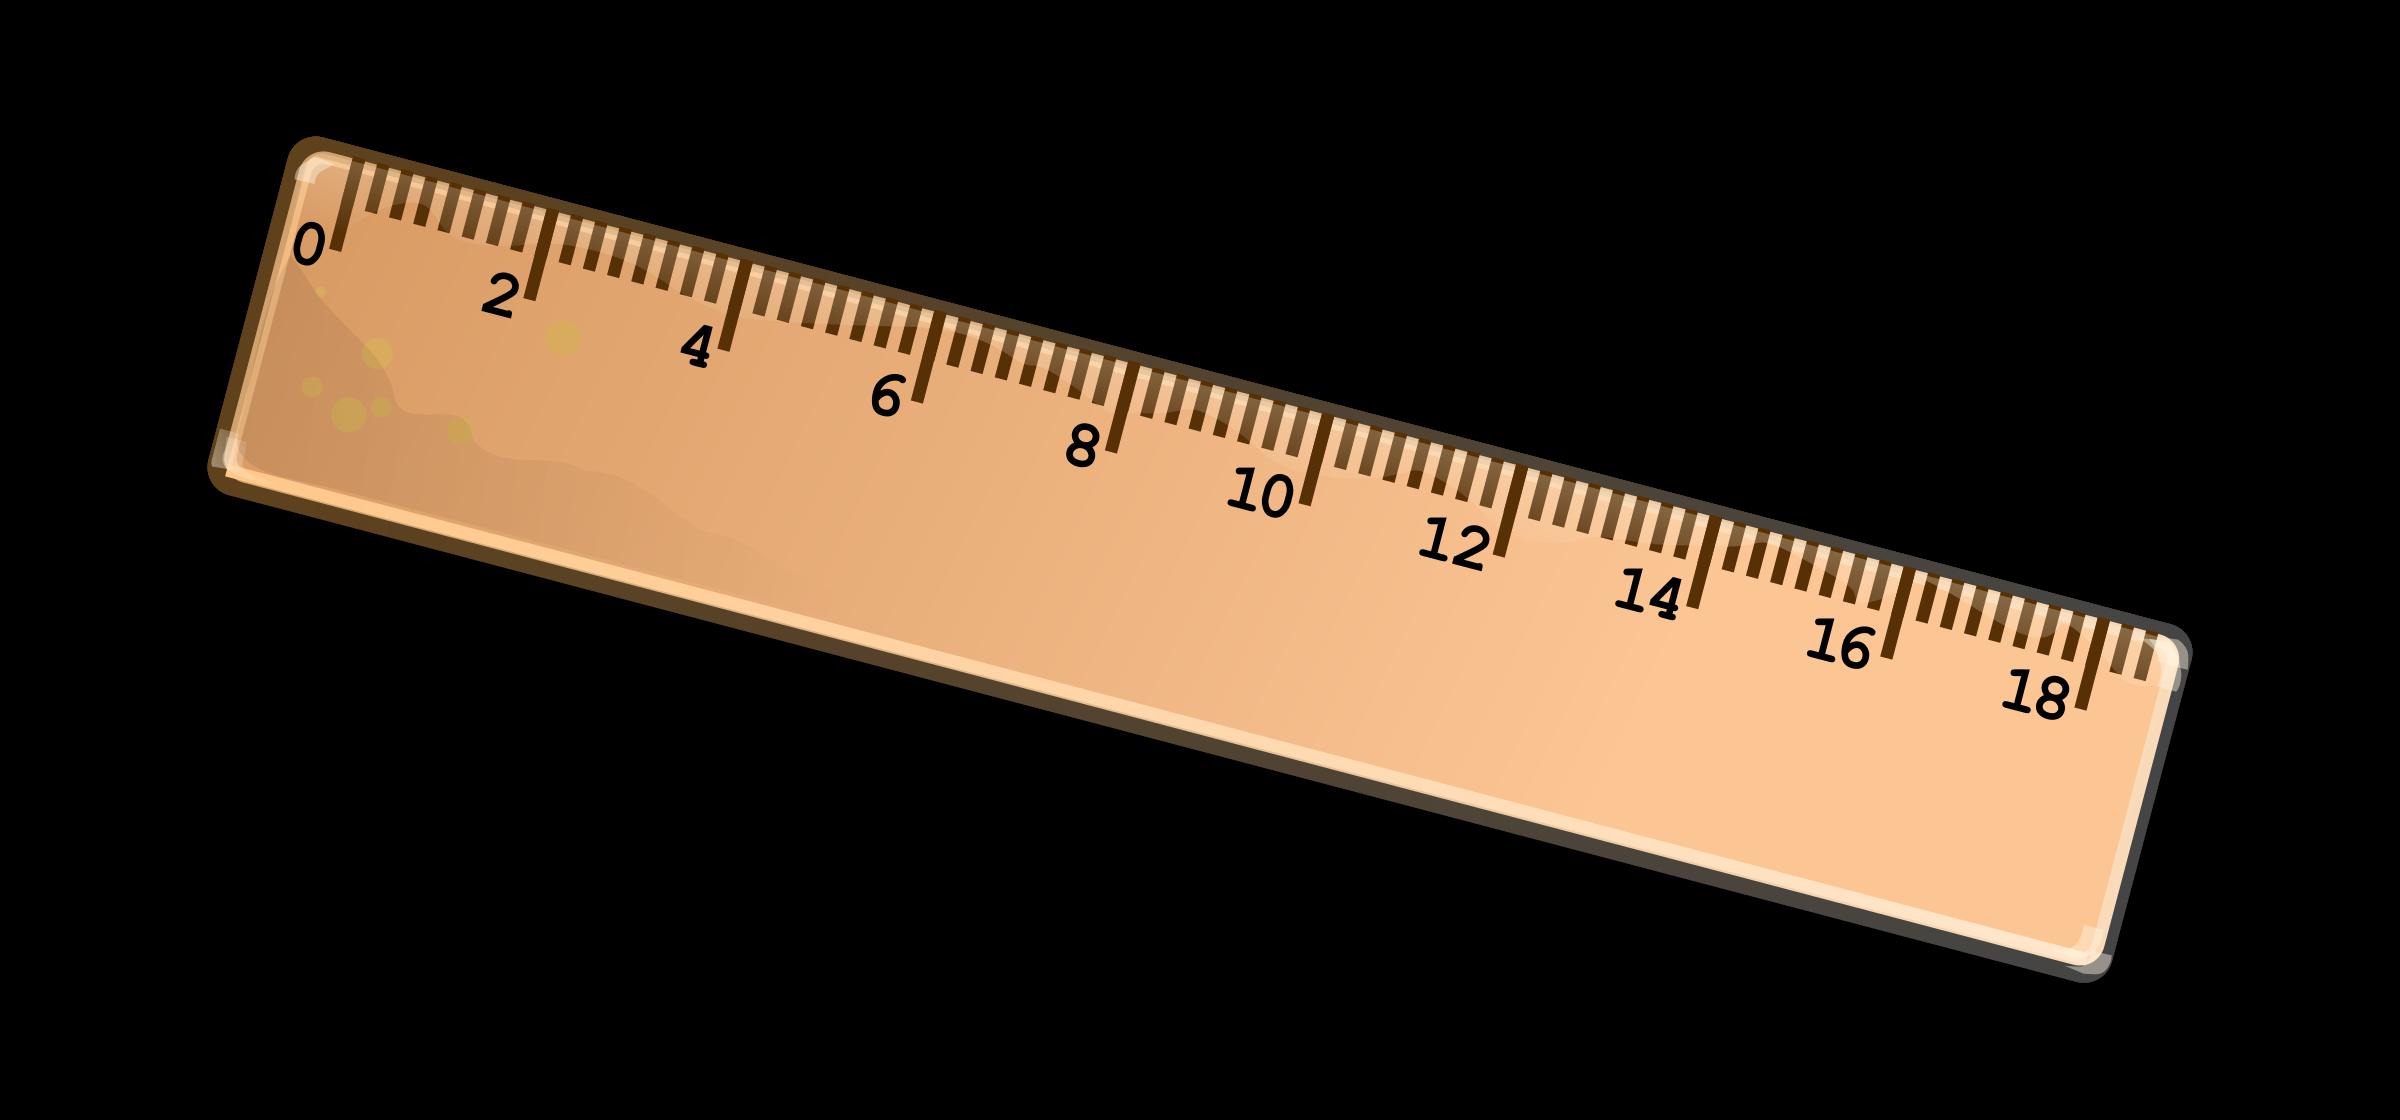 School objects clipart jpg freeuse stock Clipart - Ruler jpg freeuse stock